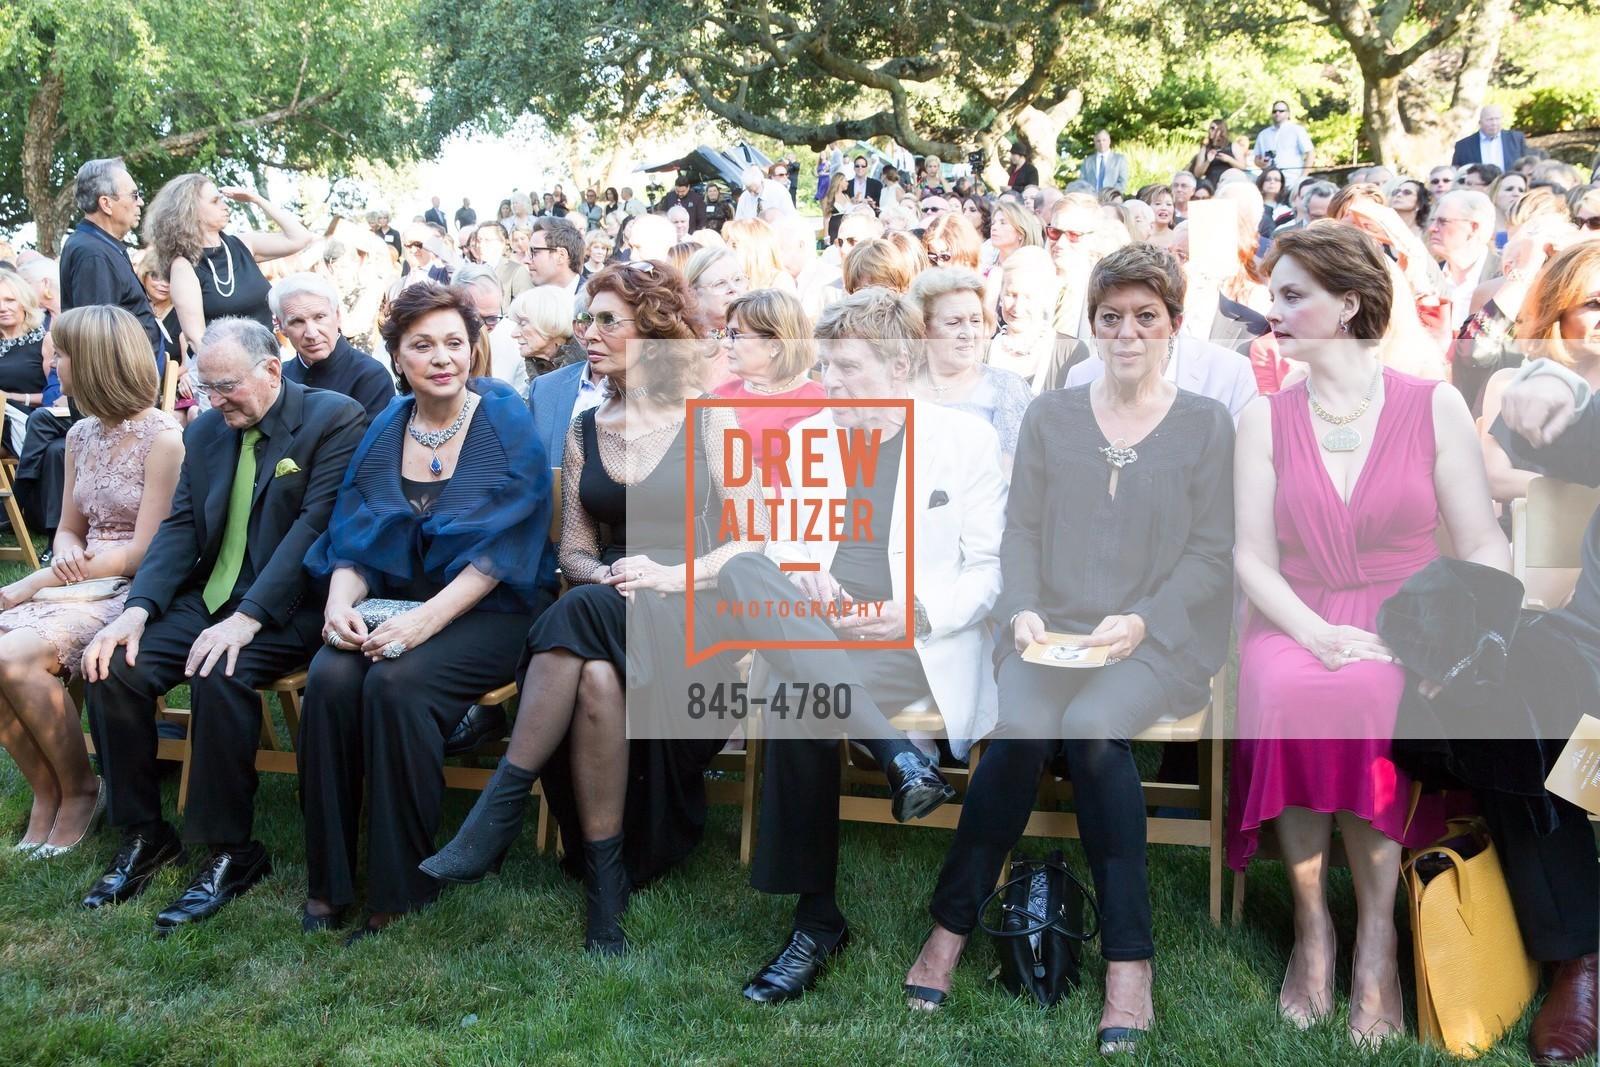 Jan Shrem, Maria Manetti Shrem, Sophia Loren, Robert Redford, Sibylle Szaggars, Nina Kotova, Photo #845-4780